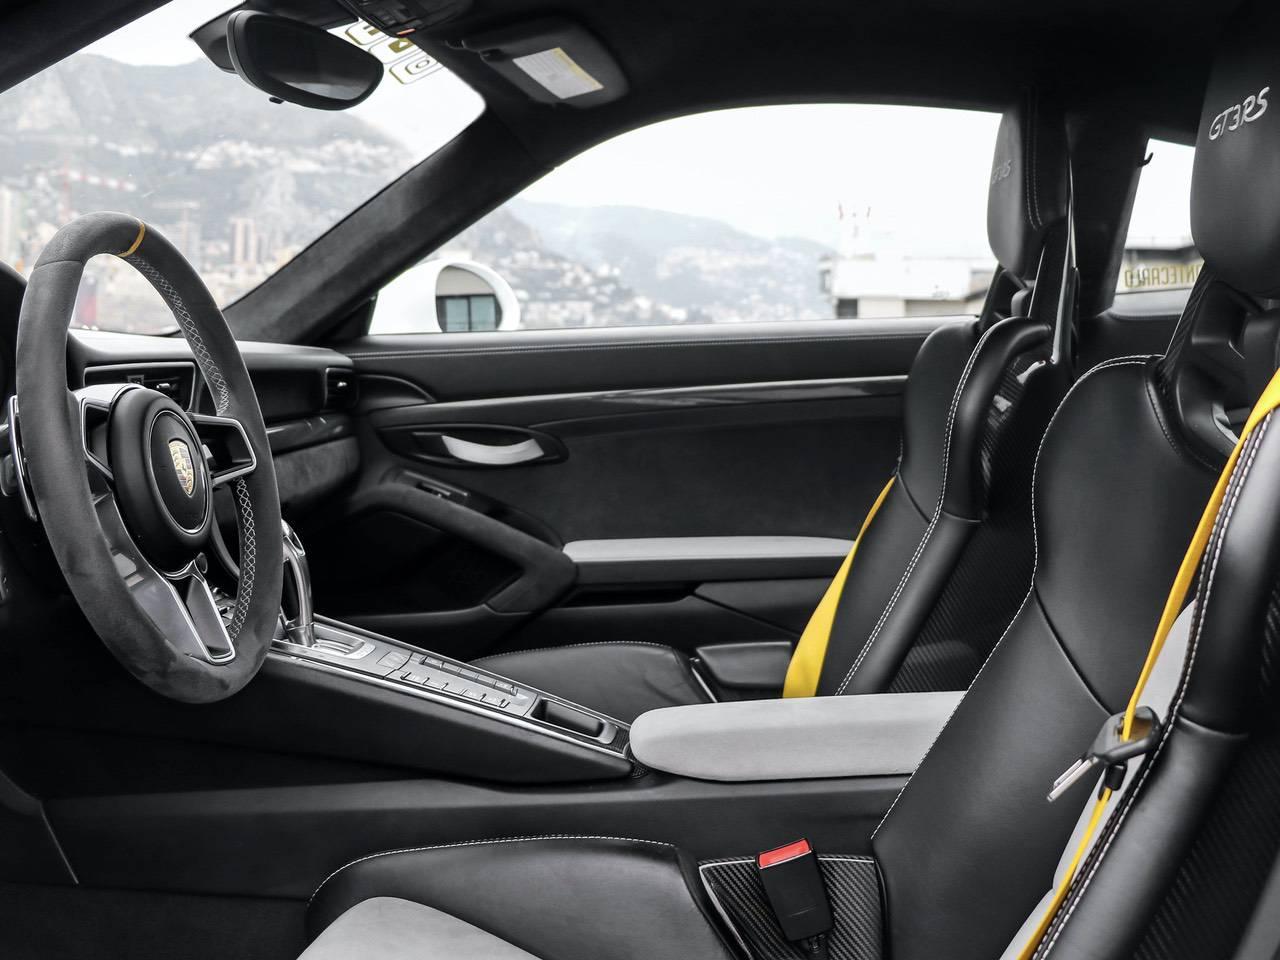 Porsche-991-Coupè-991-PDK-GT3-RS-Martini-9